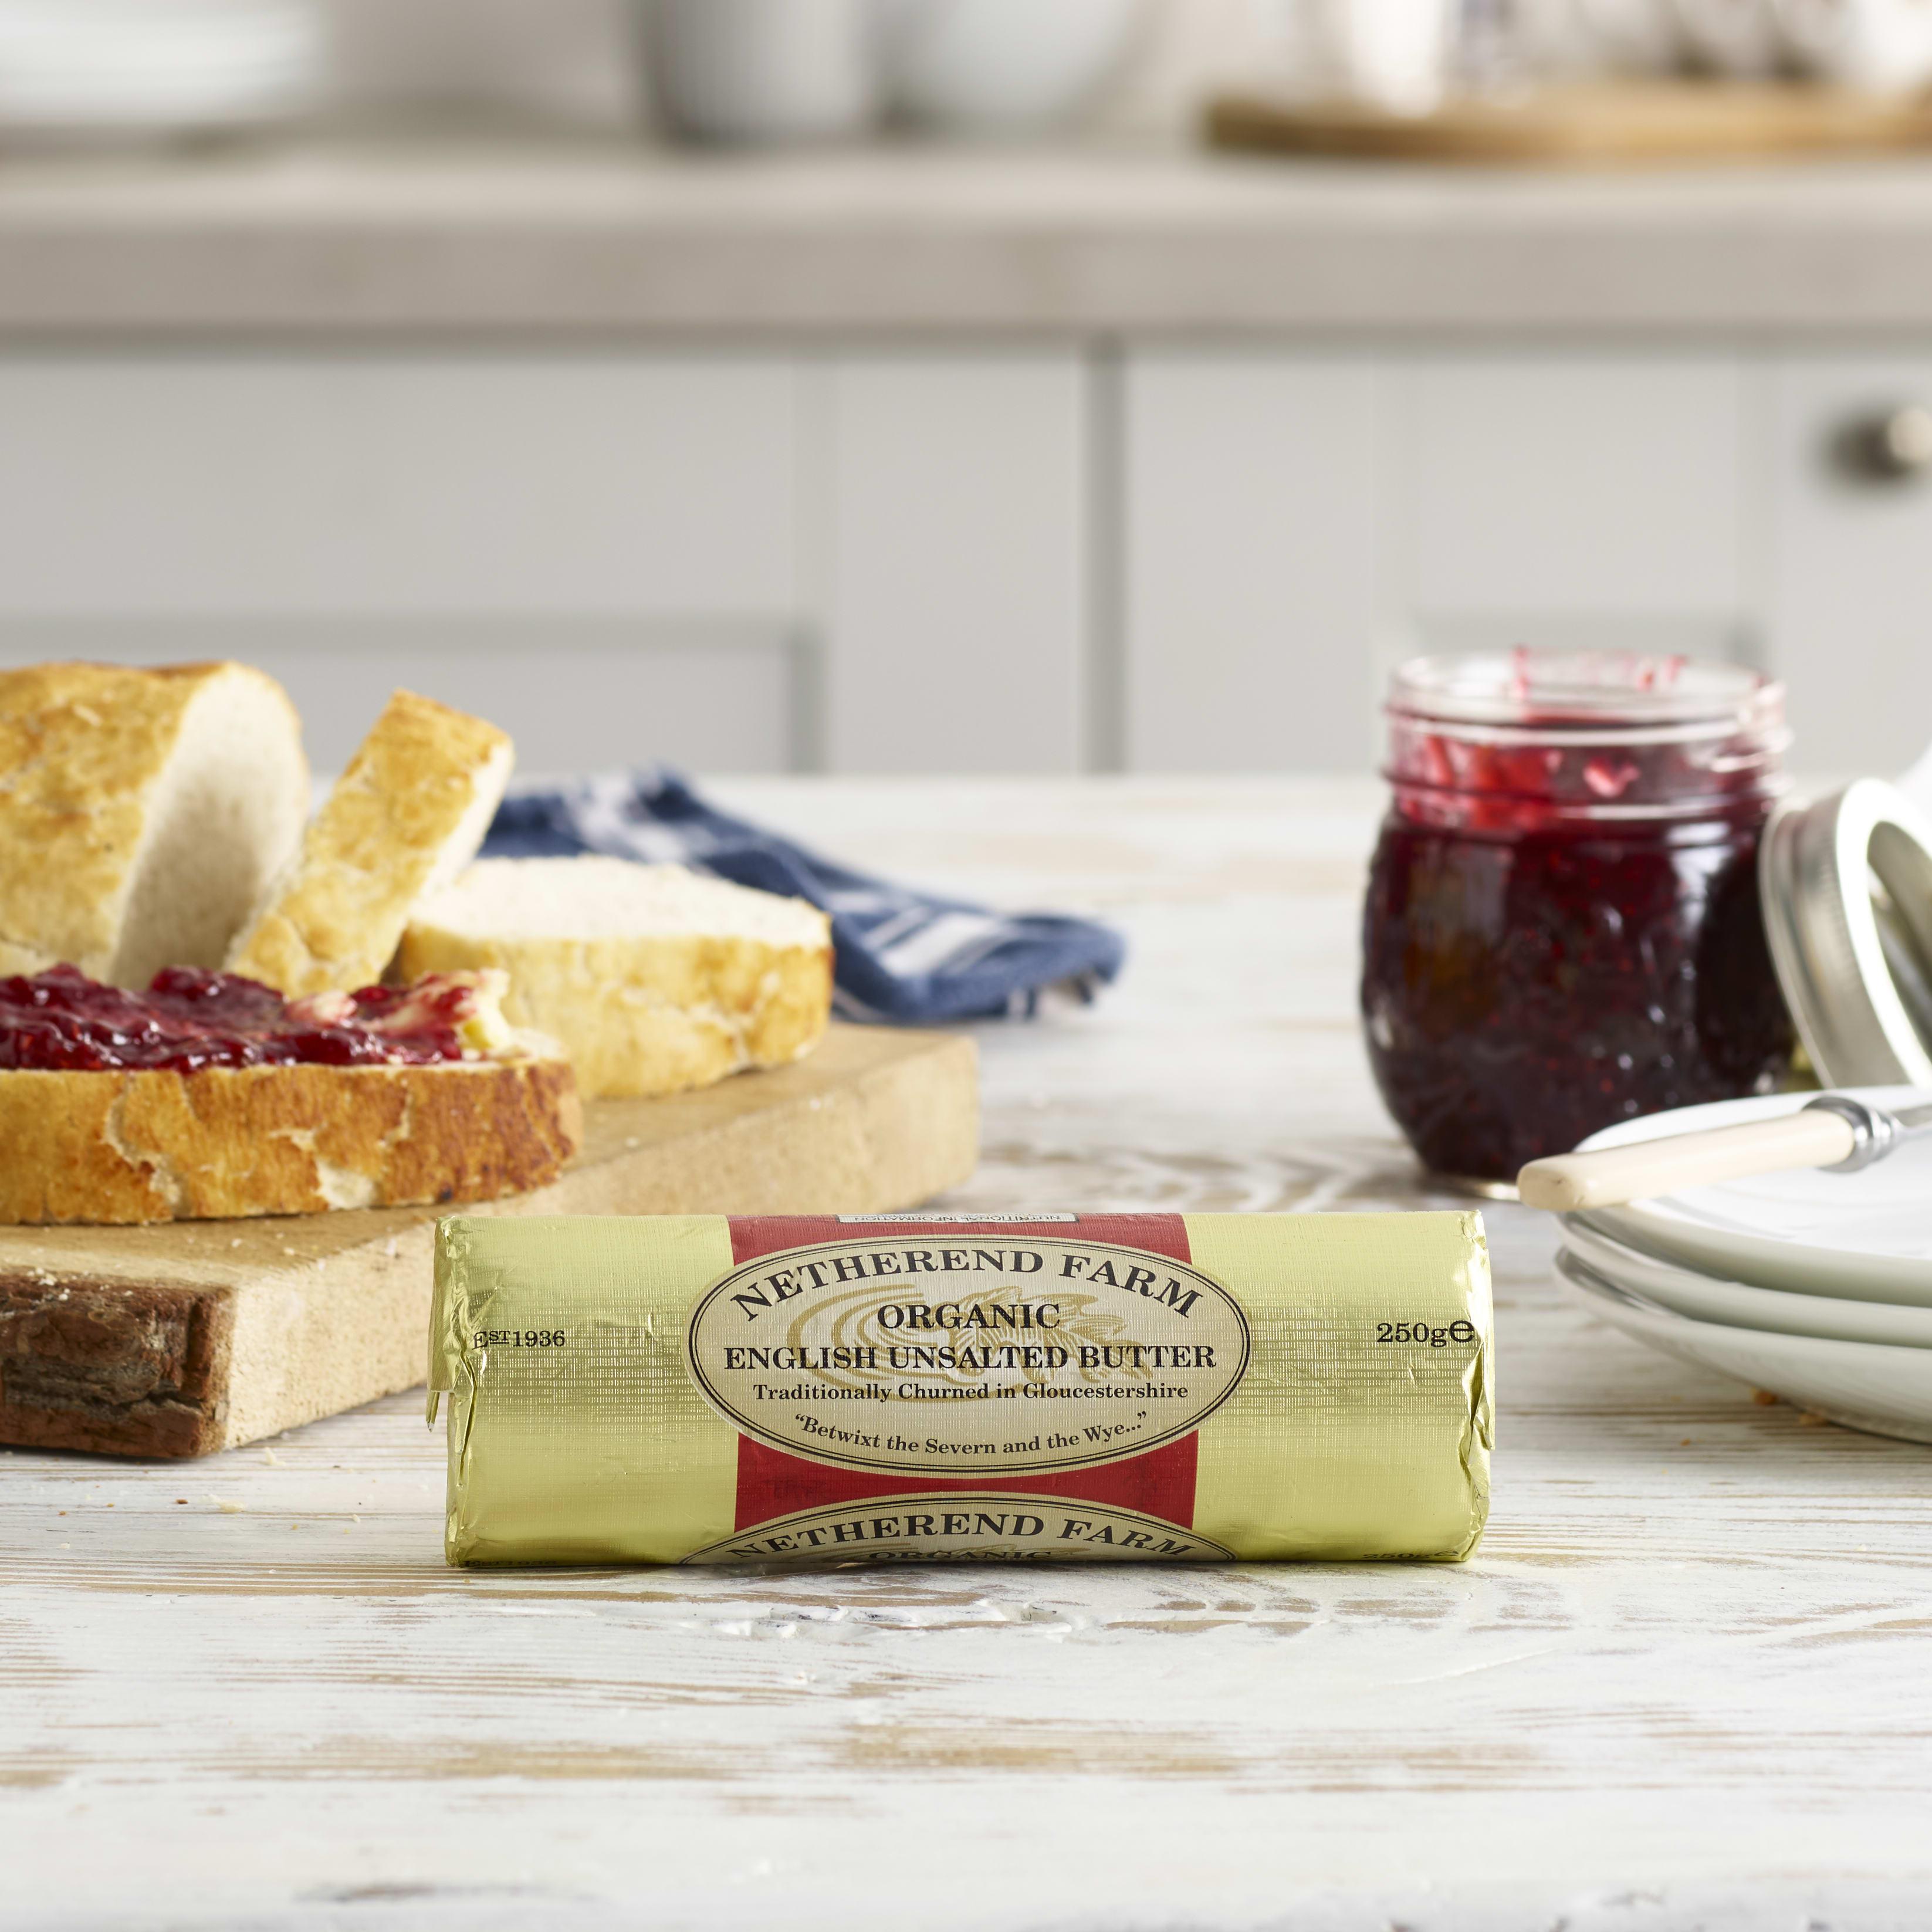 Netherend Farm Organic Unsalted Butter Roll, 250g